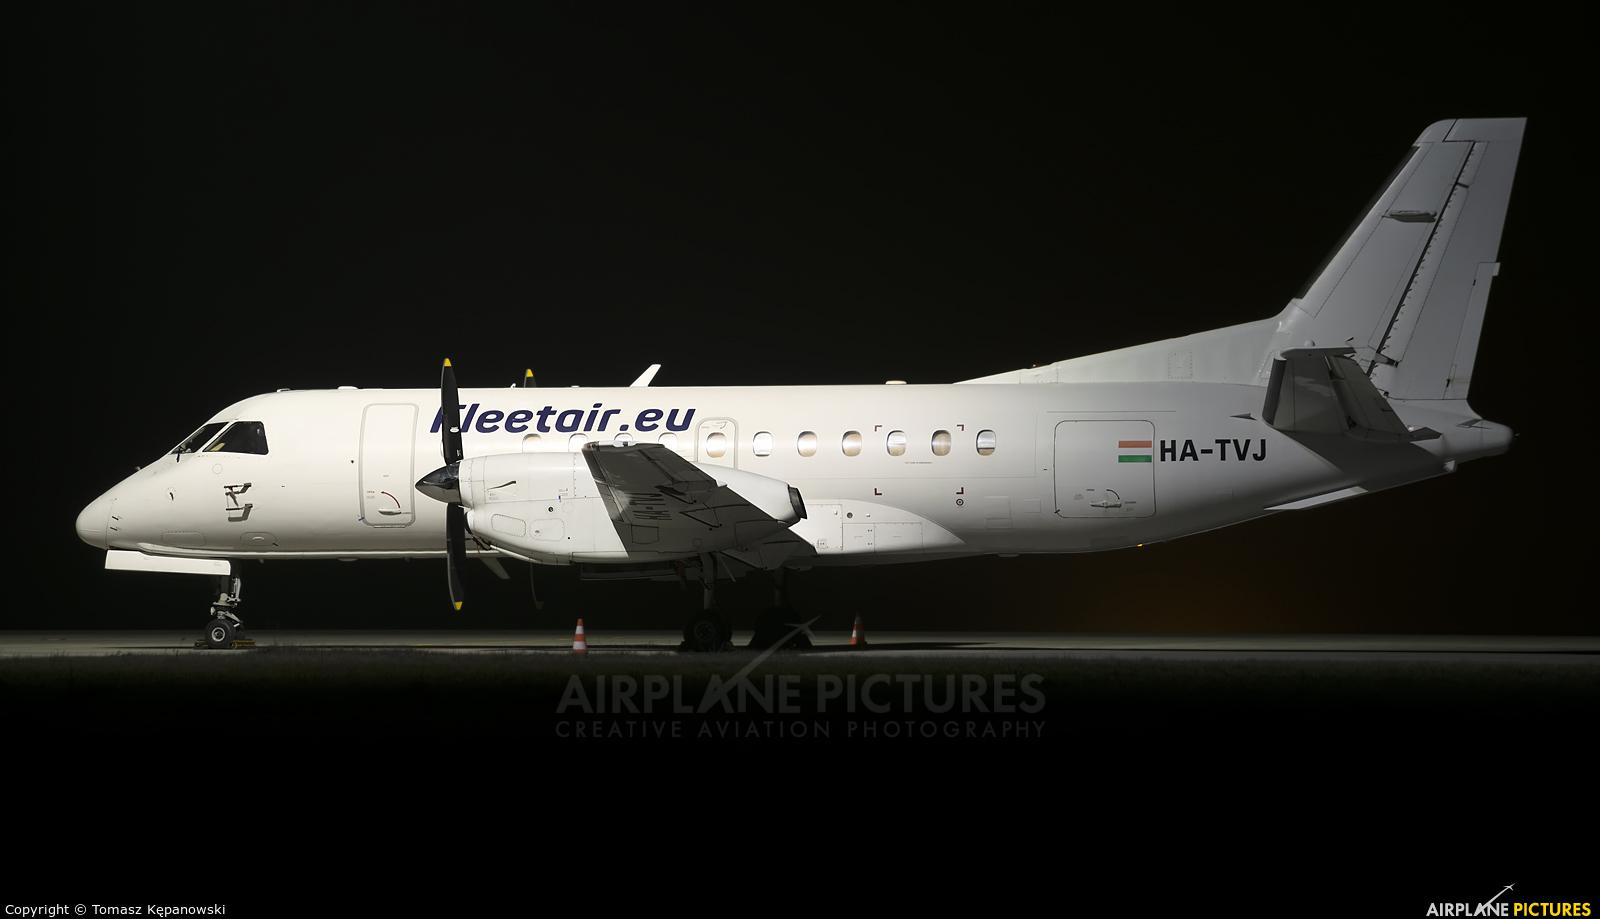 Fleet Air International HA-TVJ aircraft at Rzeszów-Jasionka